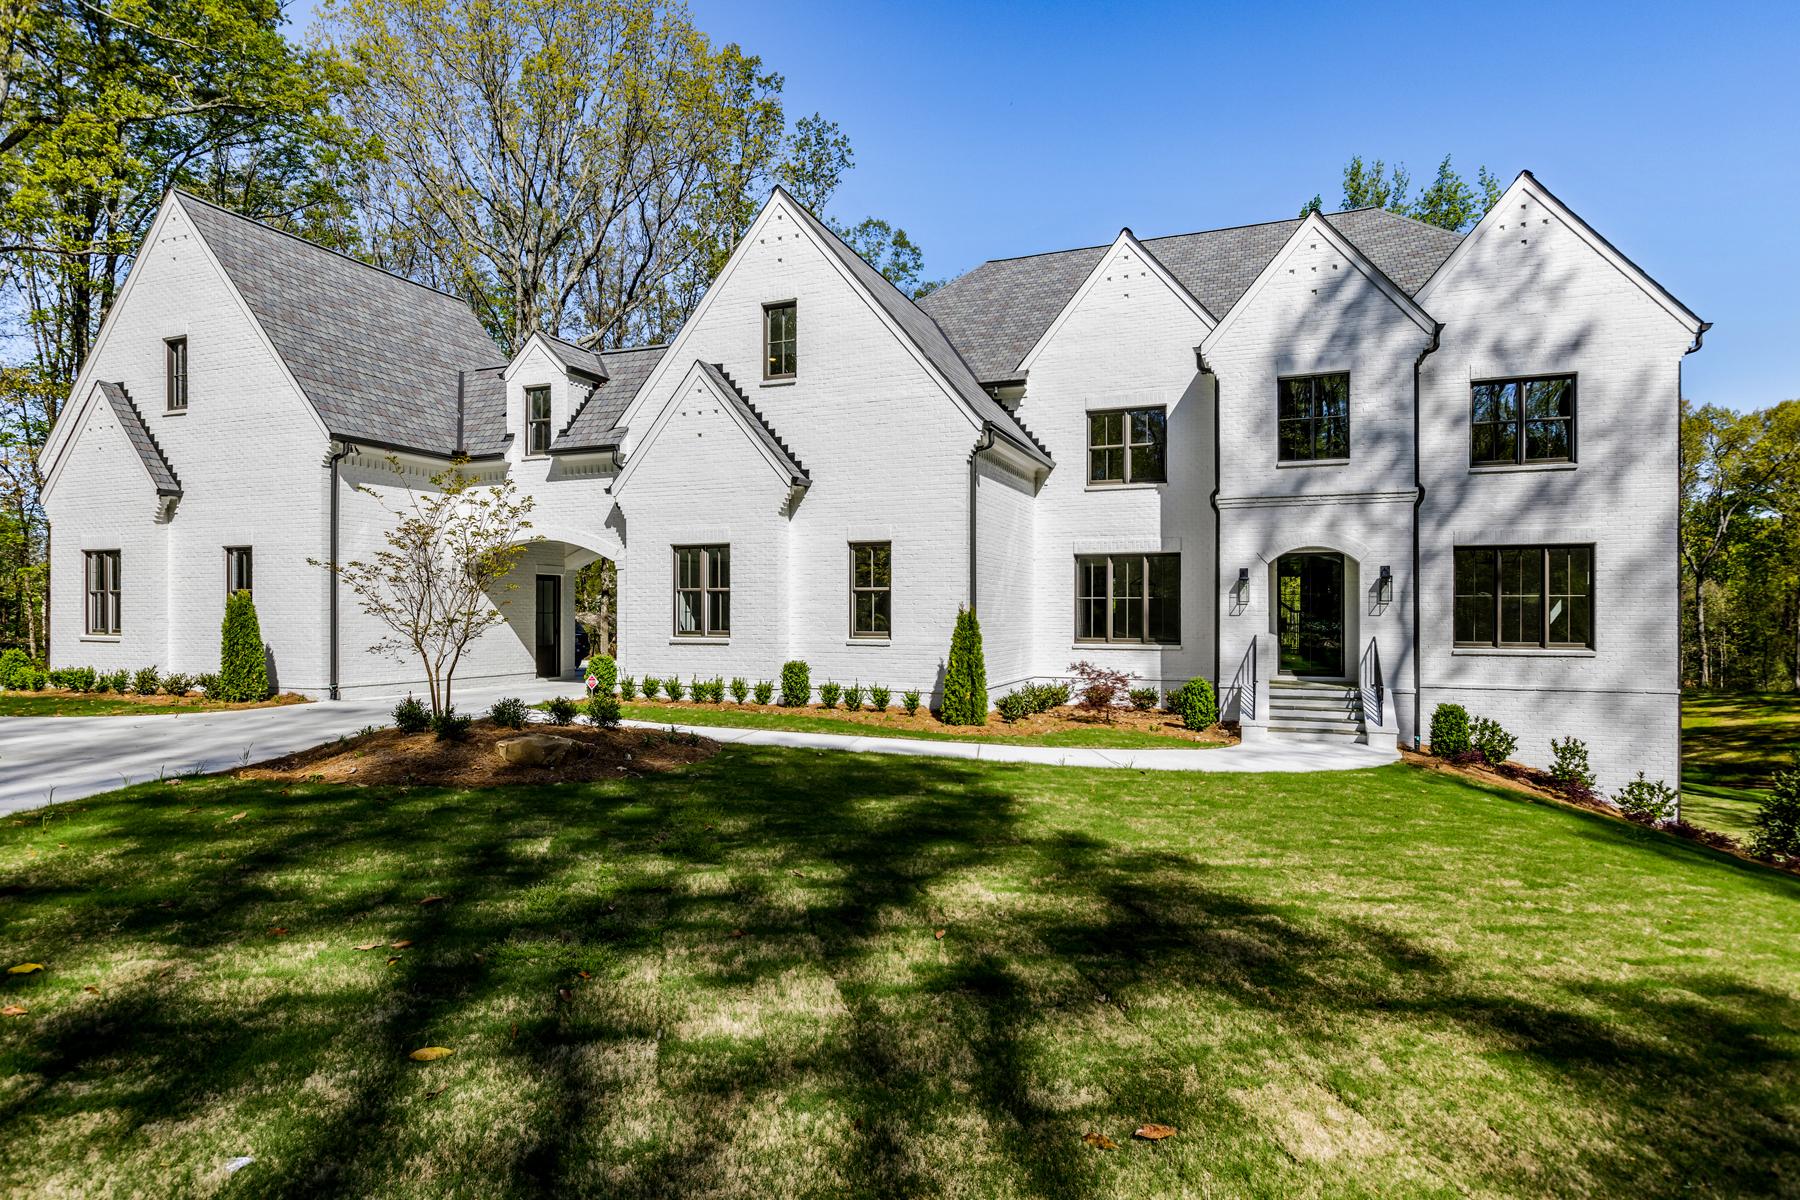 Single Family Homes for Sale at New Sandy Springs Estate 5720 Riverside Drive Atlanta, Georgia 30327 United States